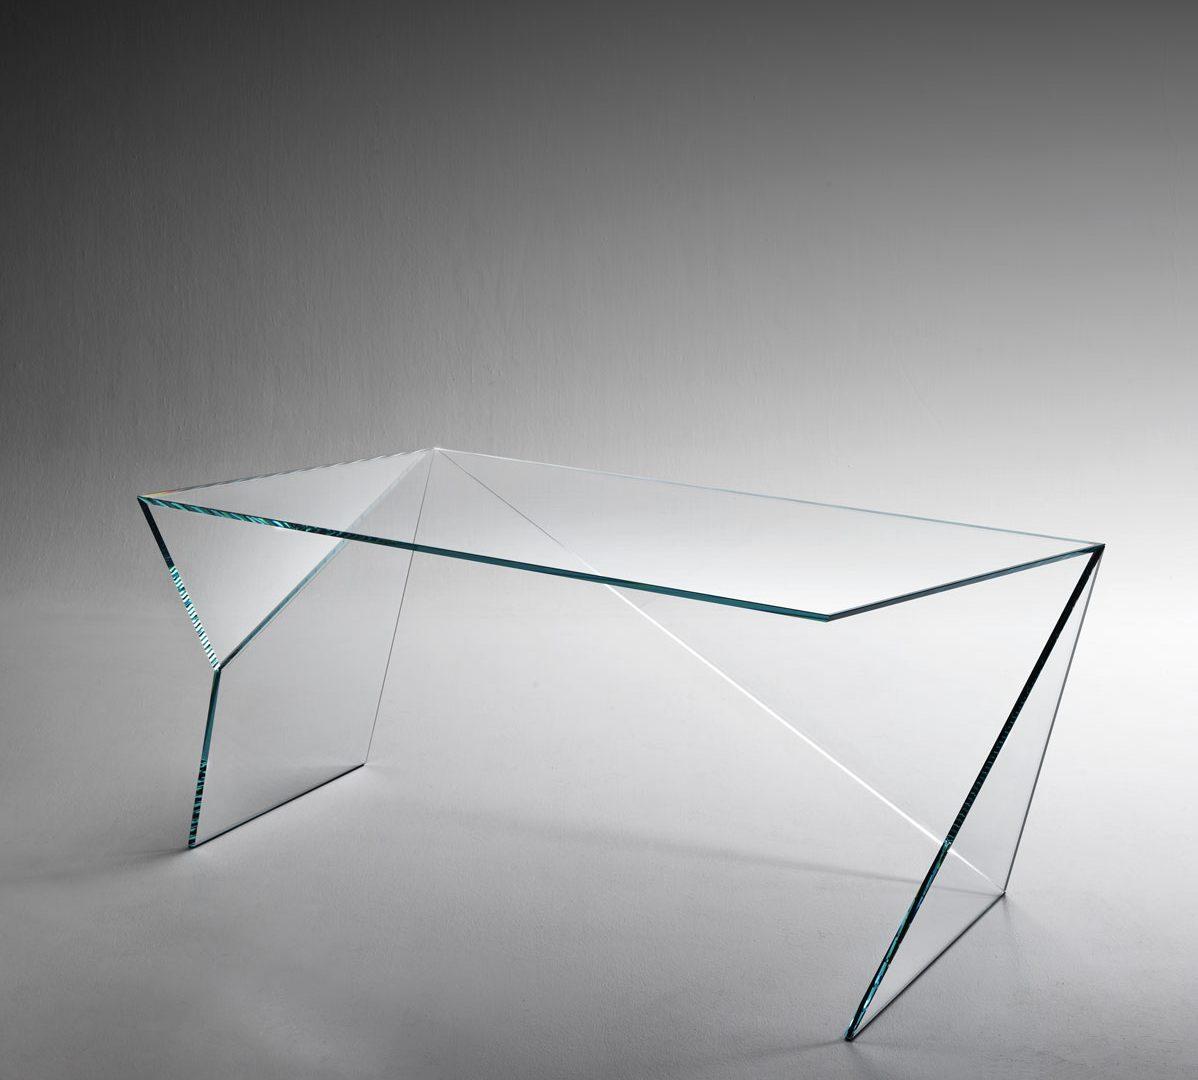 desk-Origami-barberini-gunnell-3